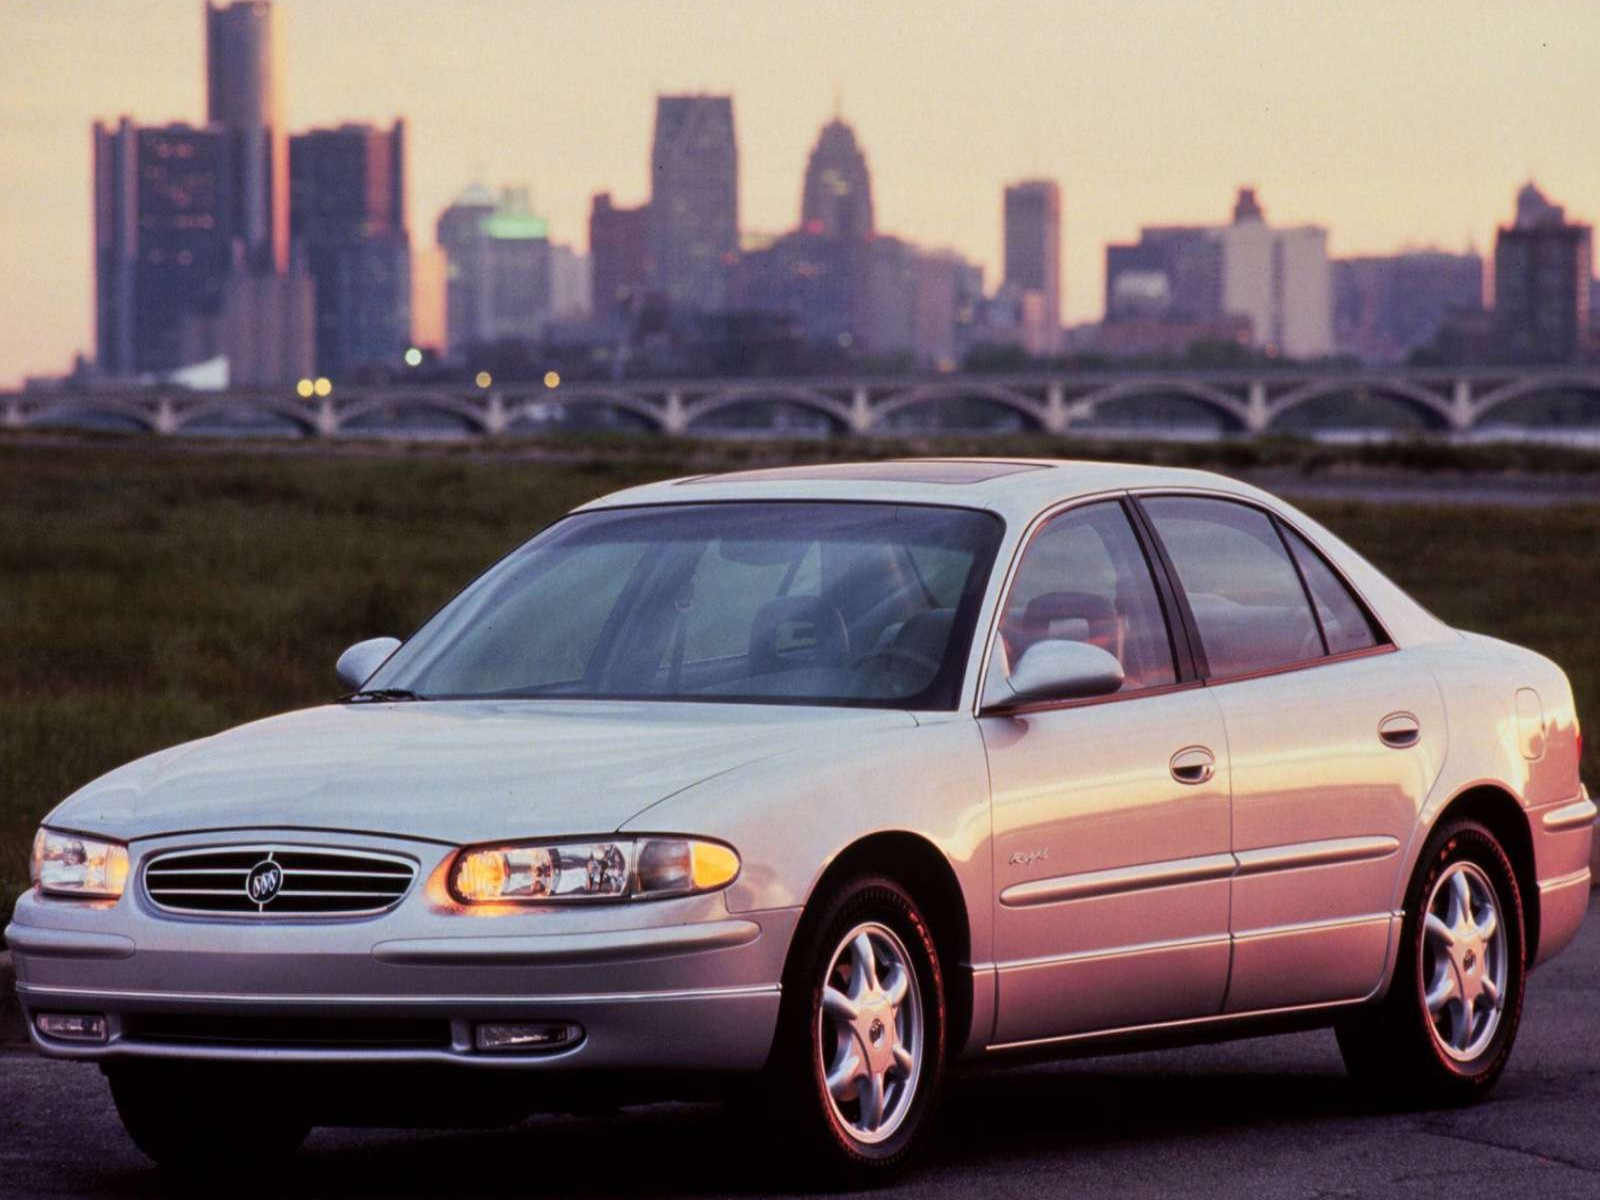 Buick Regal on 1999 Buick Rainier